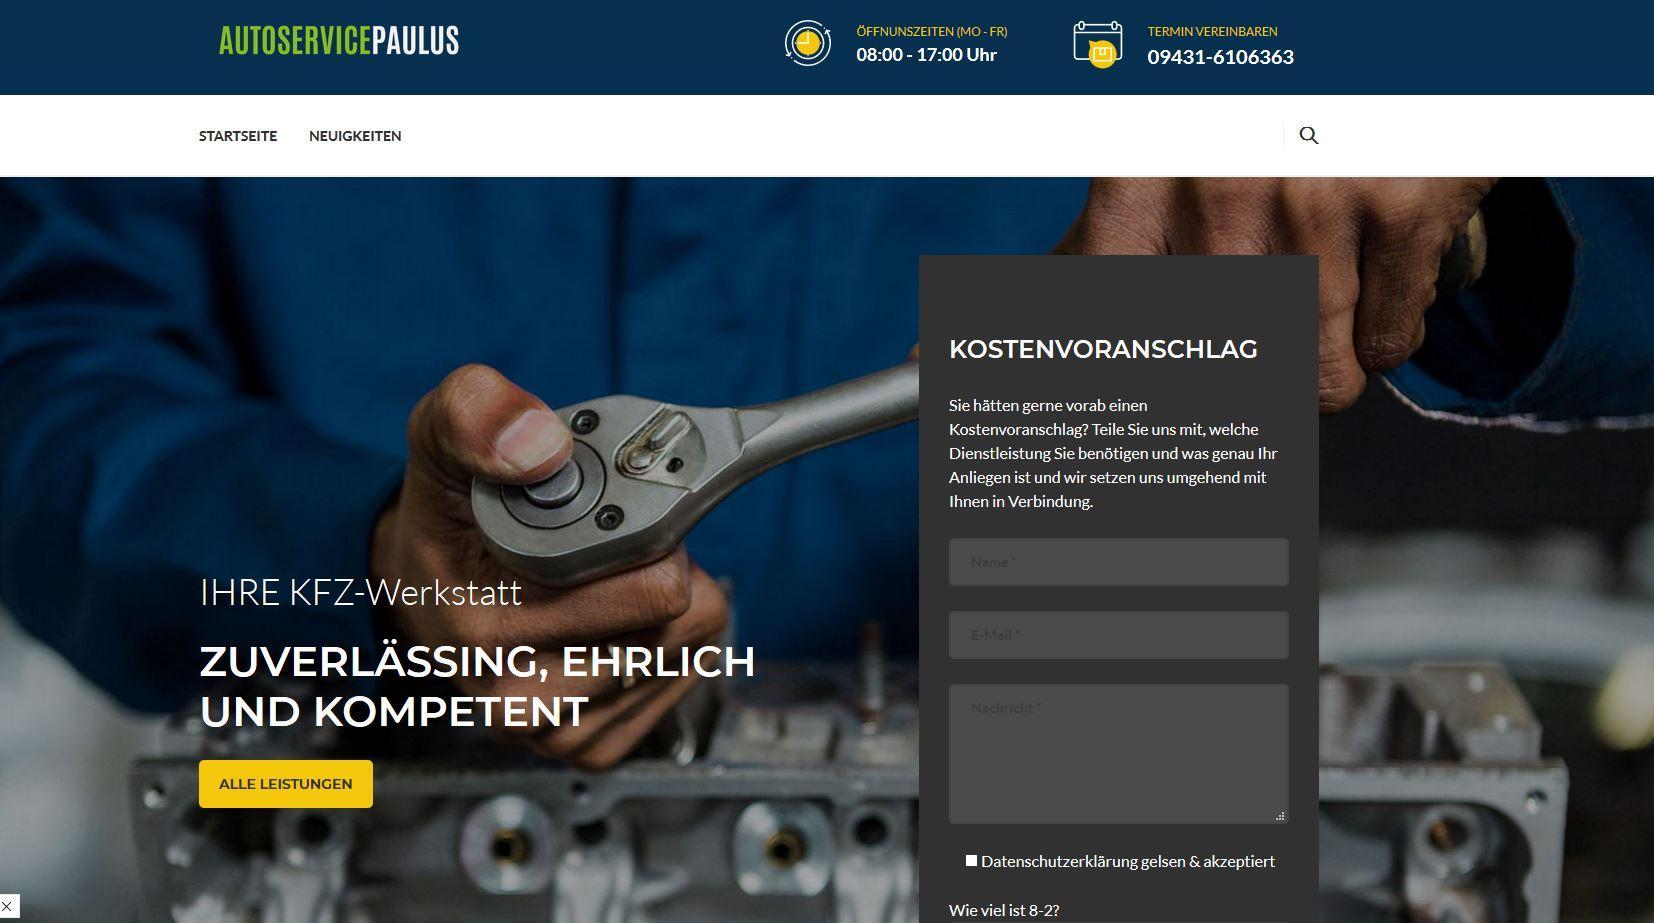 AutoService Paulus - Öl Wechsel Woche ab 24,90€